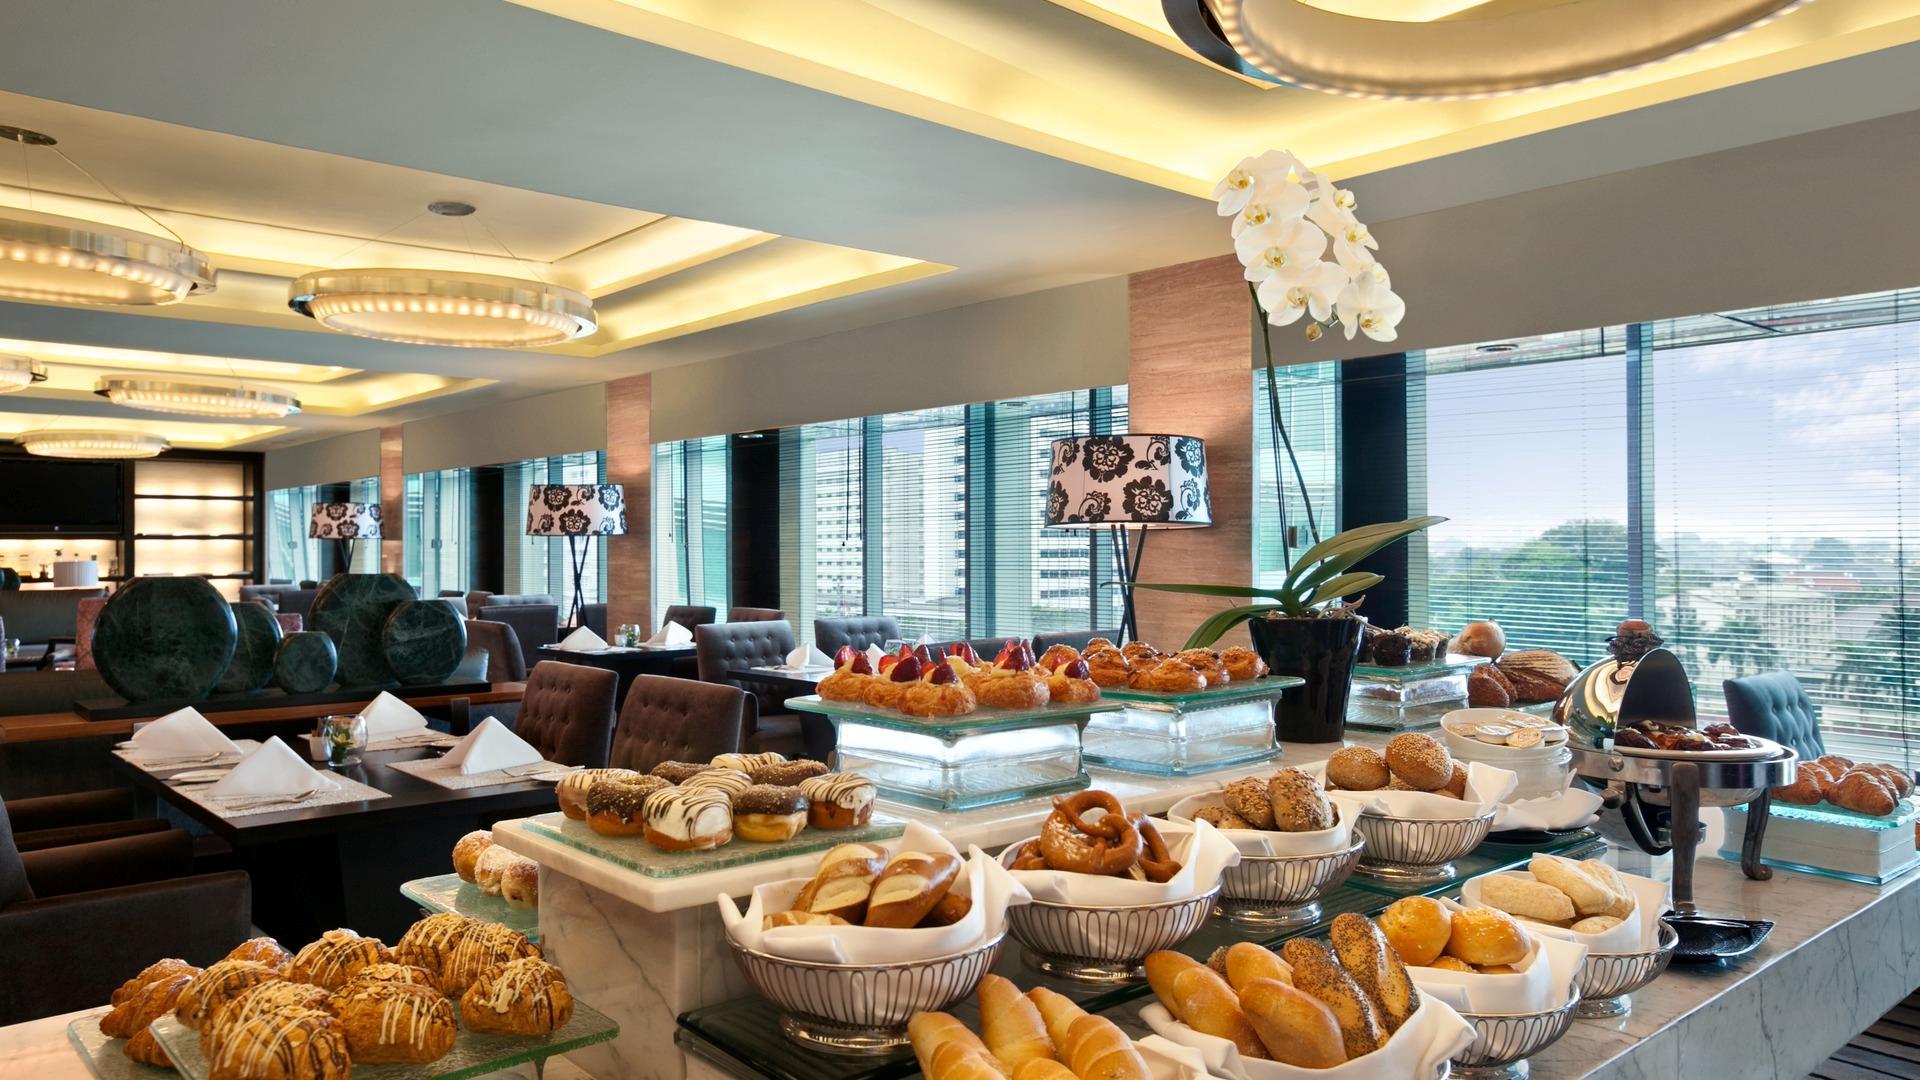 Luxury 5 Star Hotel Jakarta Indonesia Kempinski 1 59 Dunia